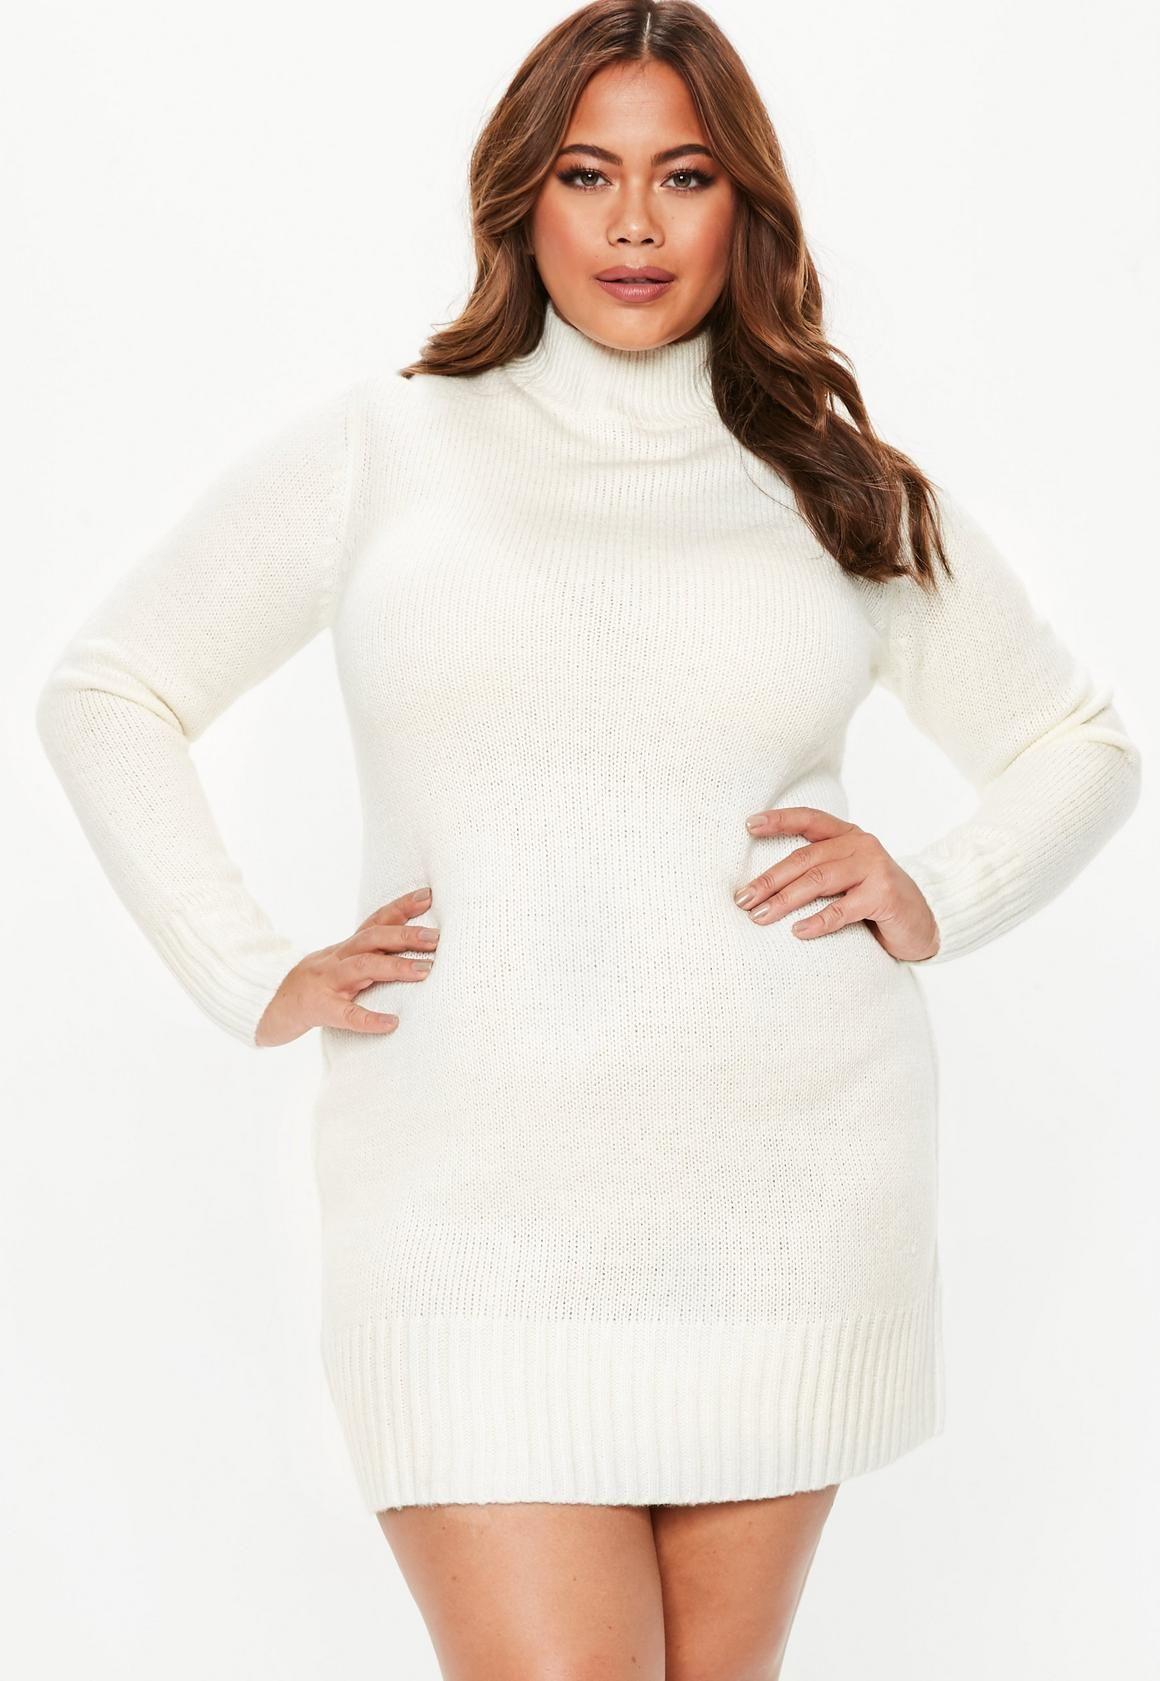 Plus Size Cream Turtle Neck Jumper Dress In 2019 Love It